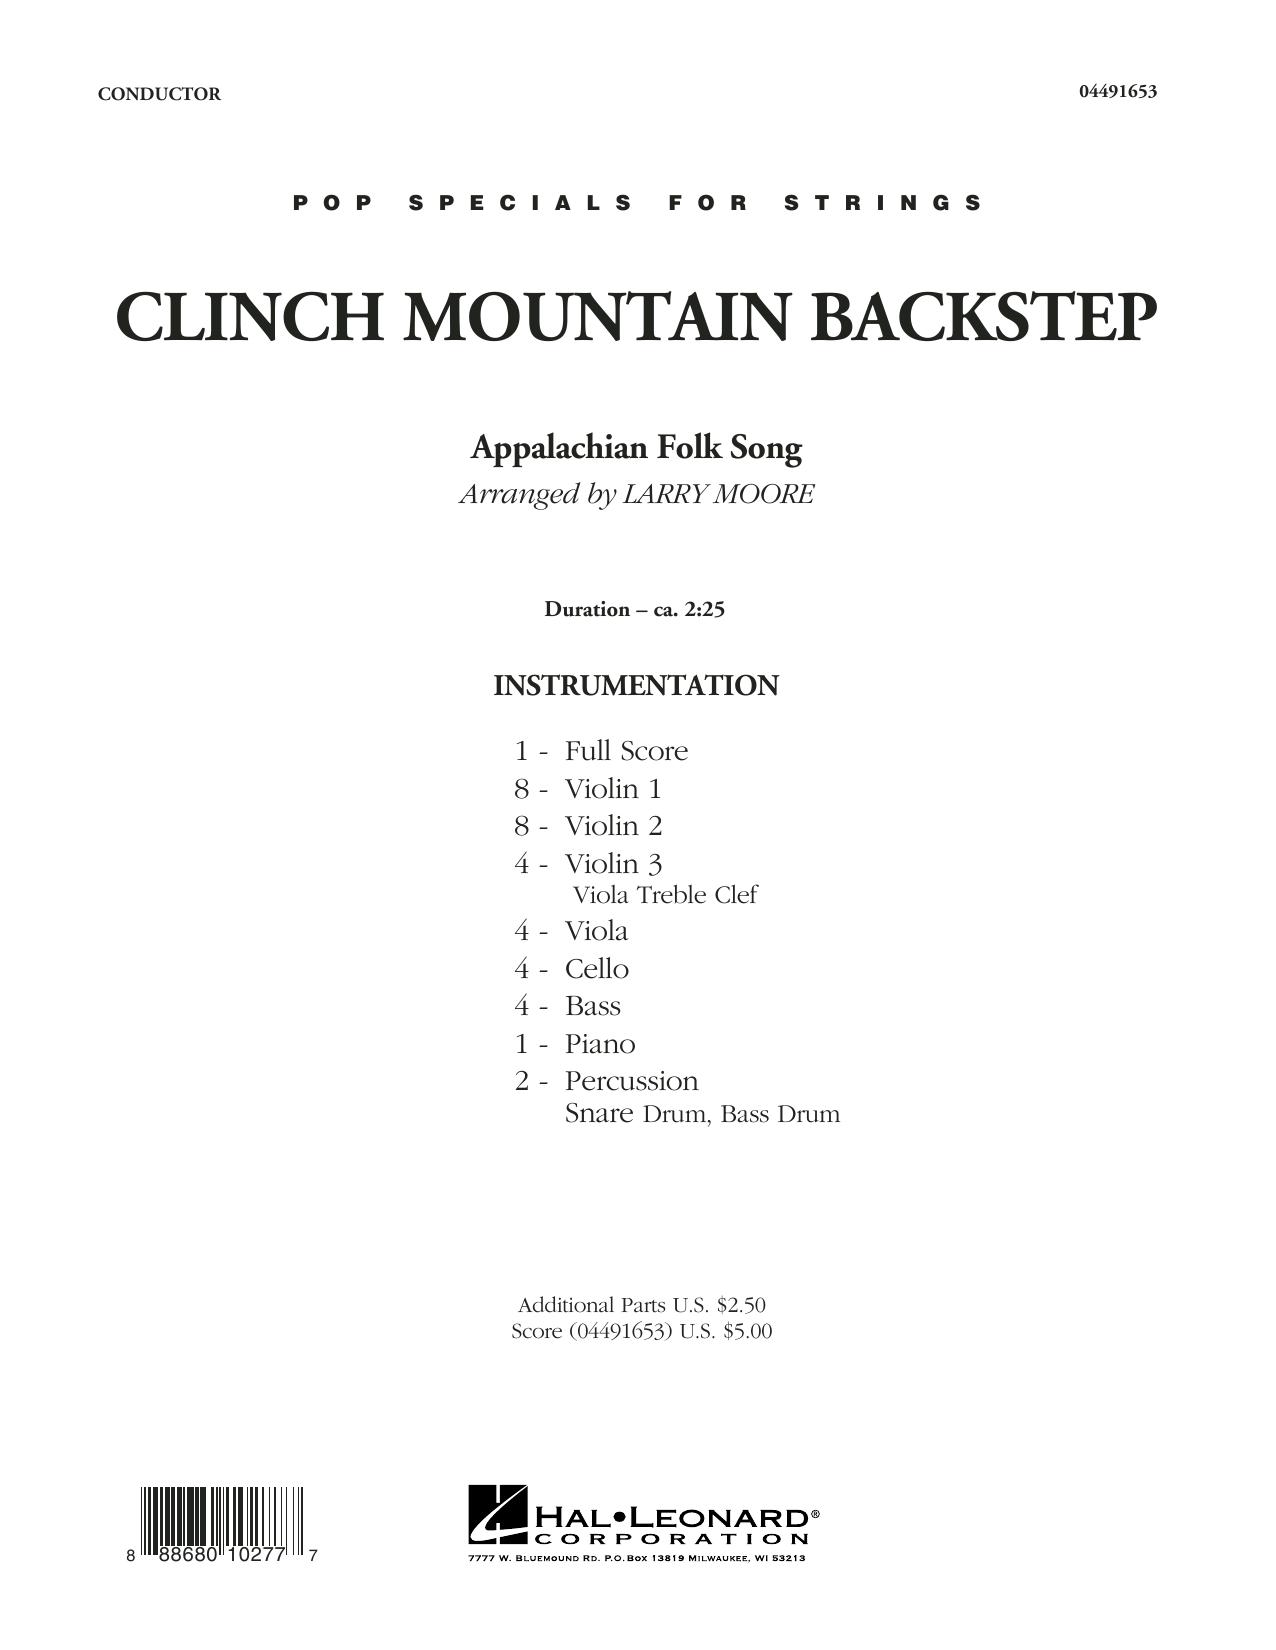 Clinch Mountain Backstep - Conductor Score (Full Score) sheet music